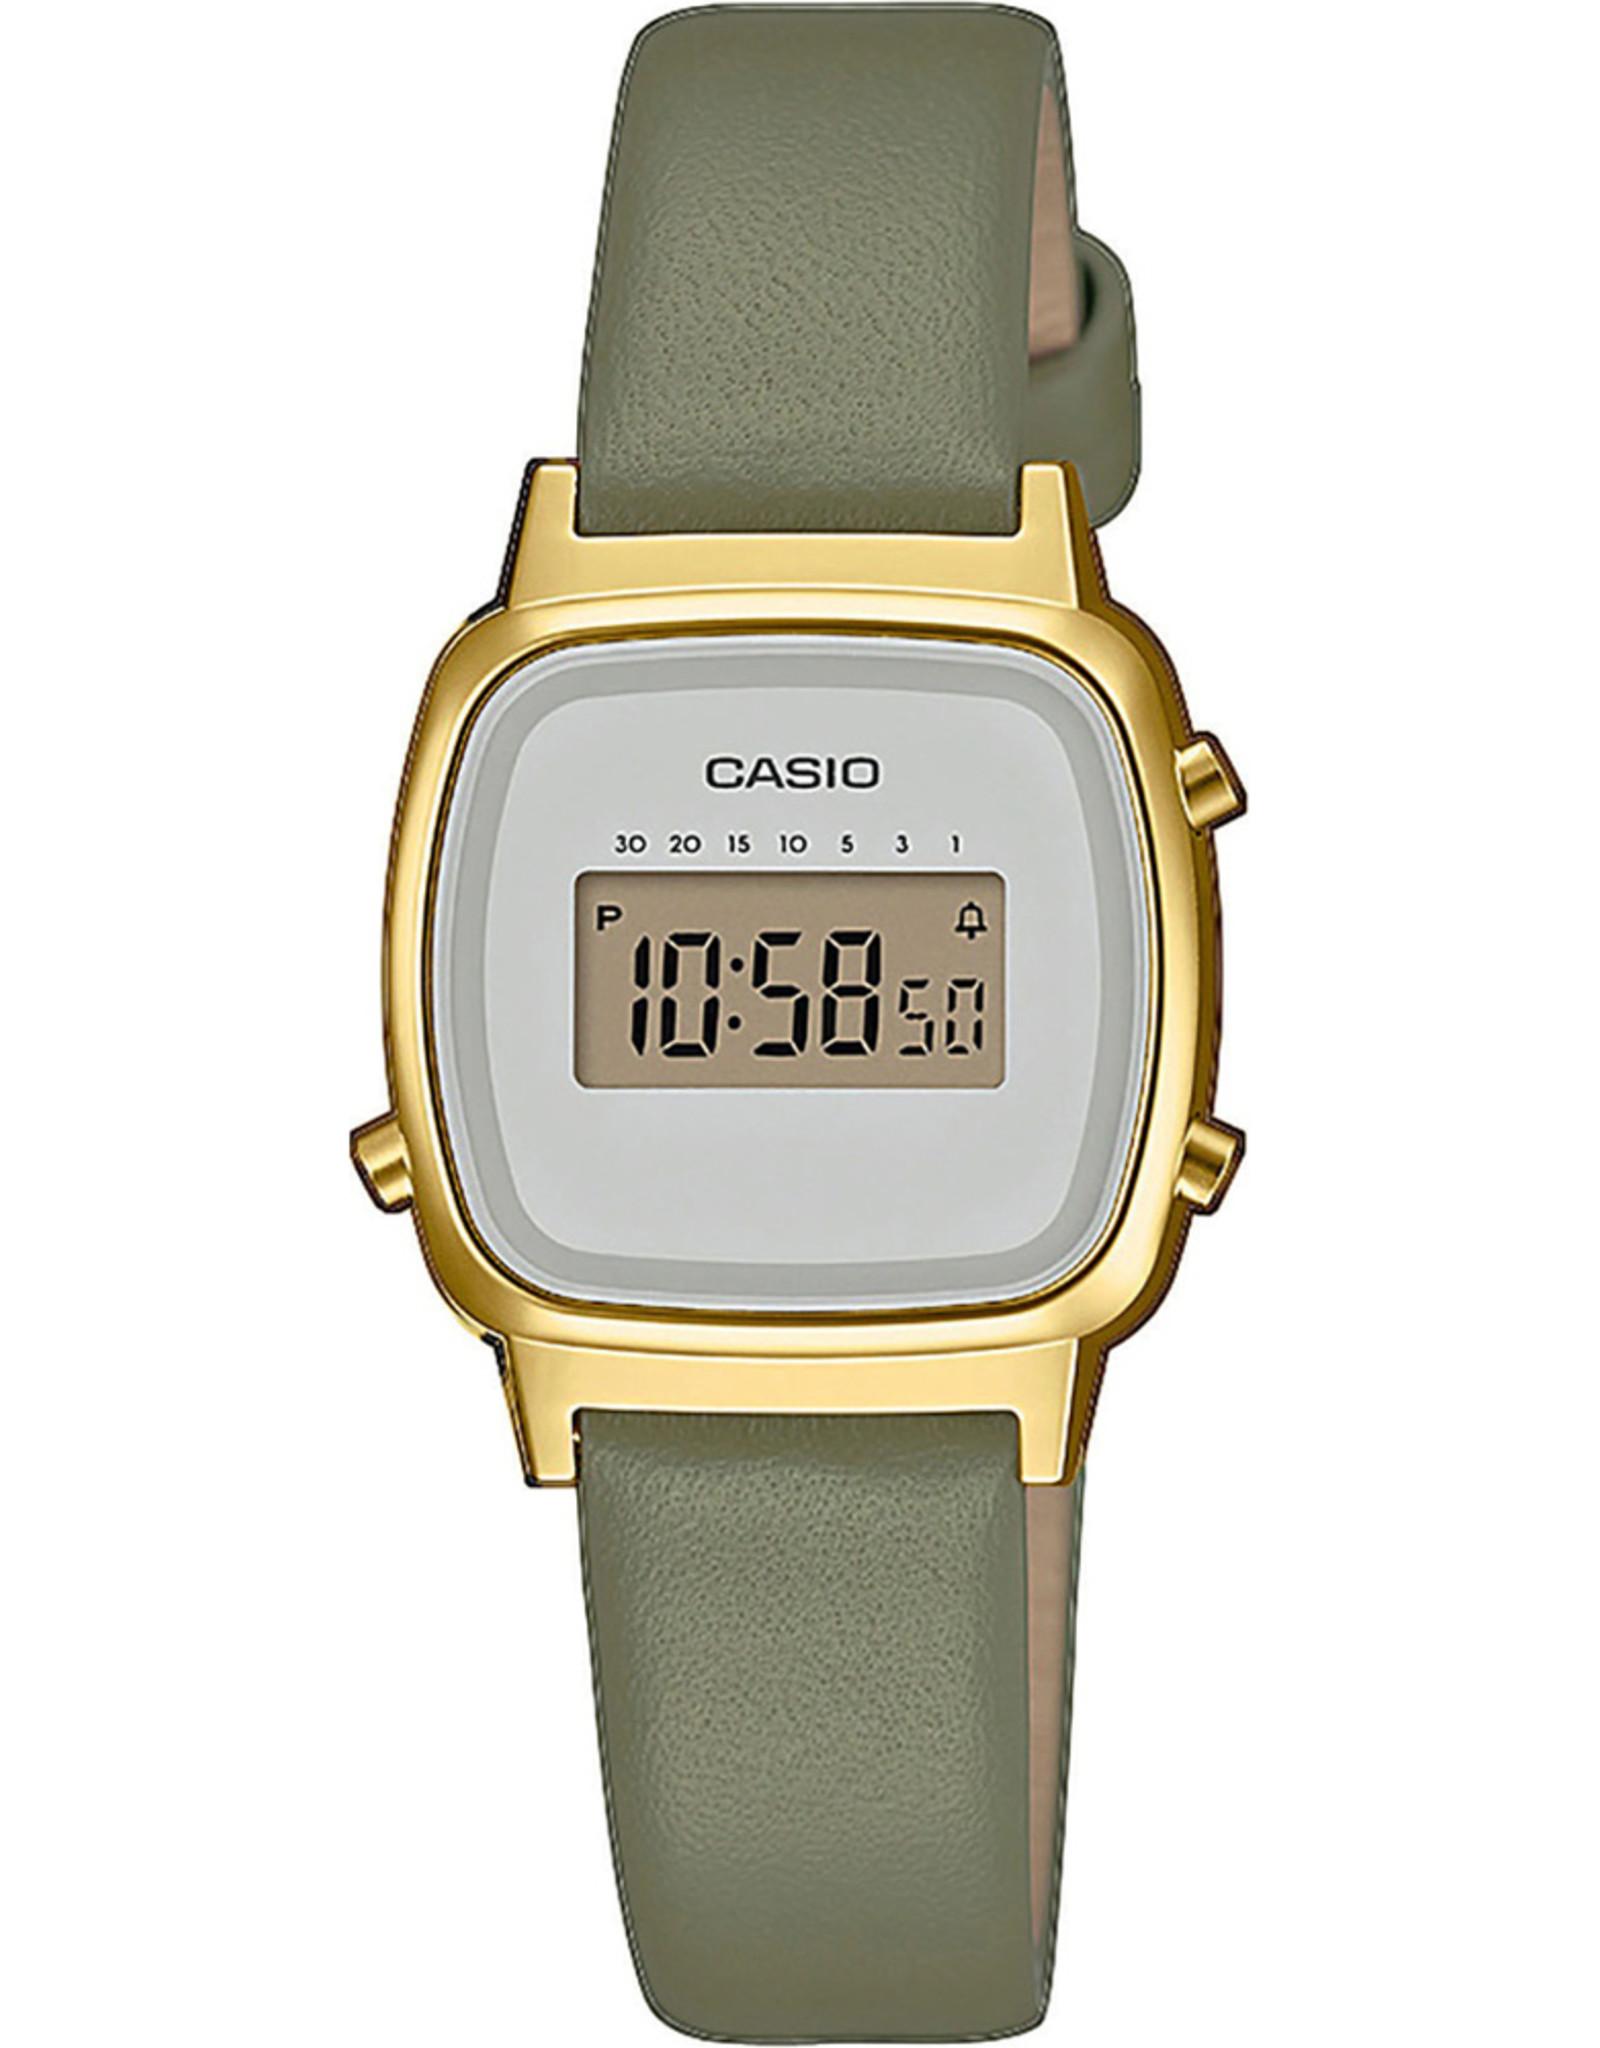 Casio la670wefl-3ef